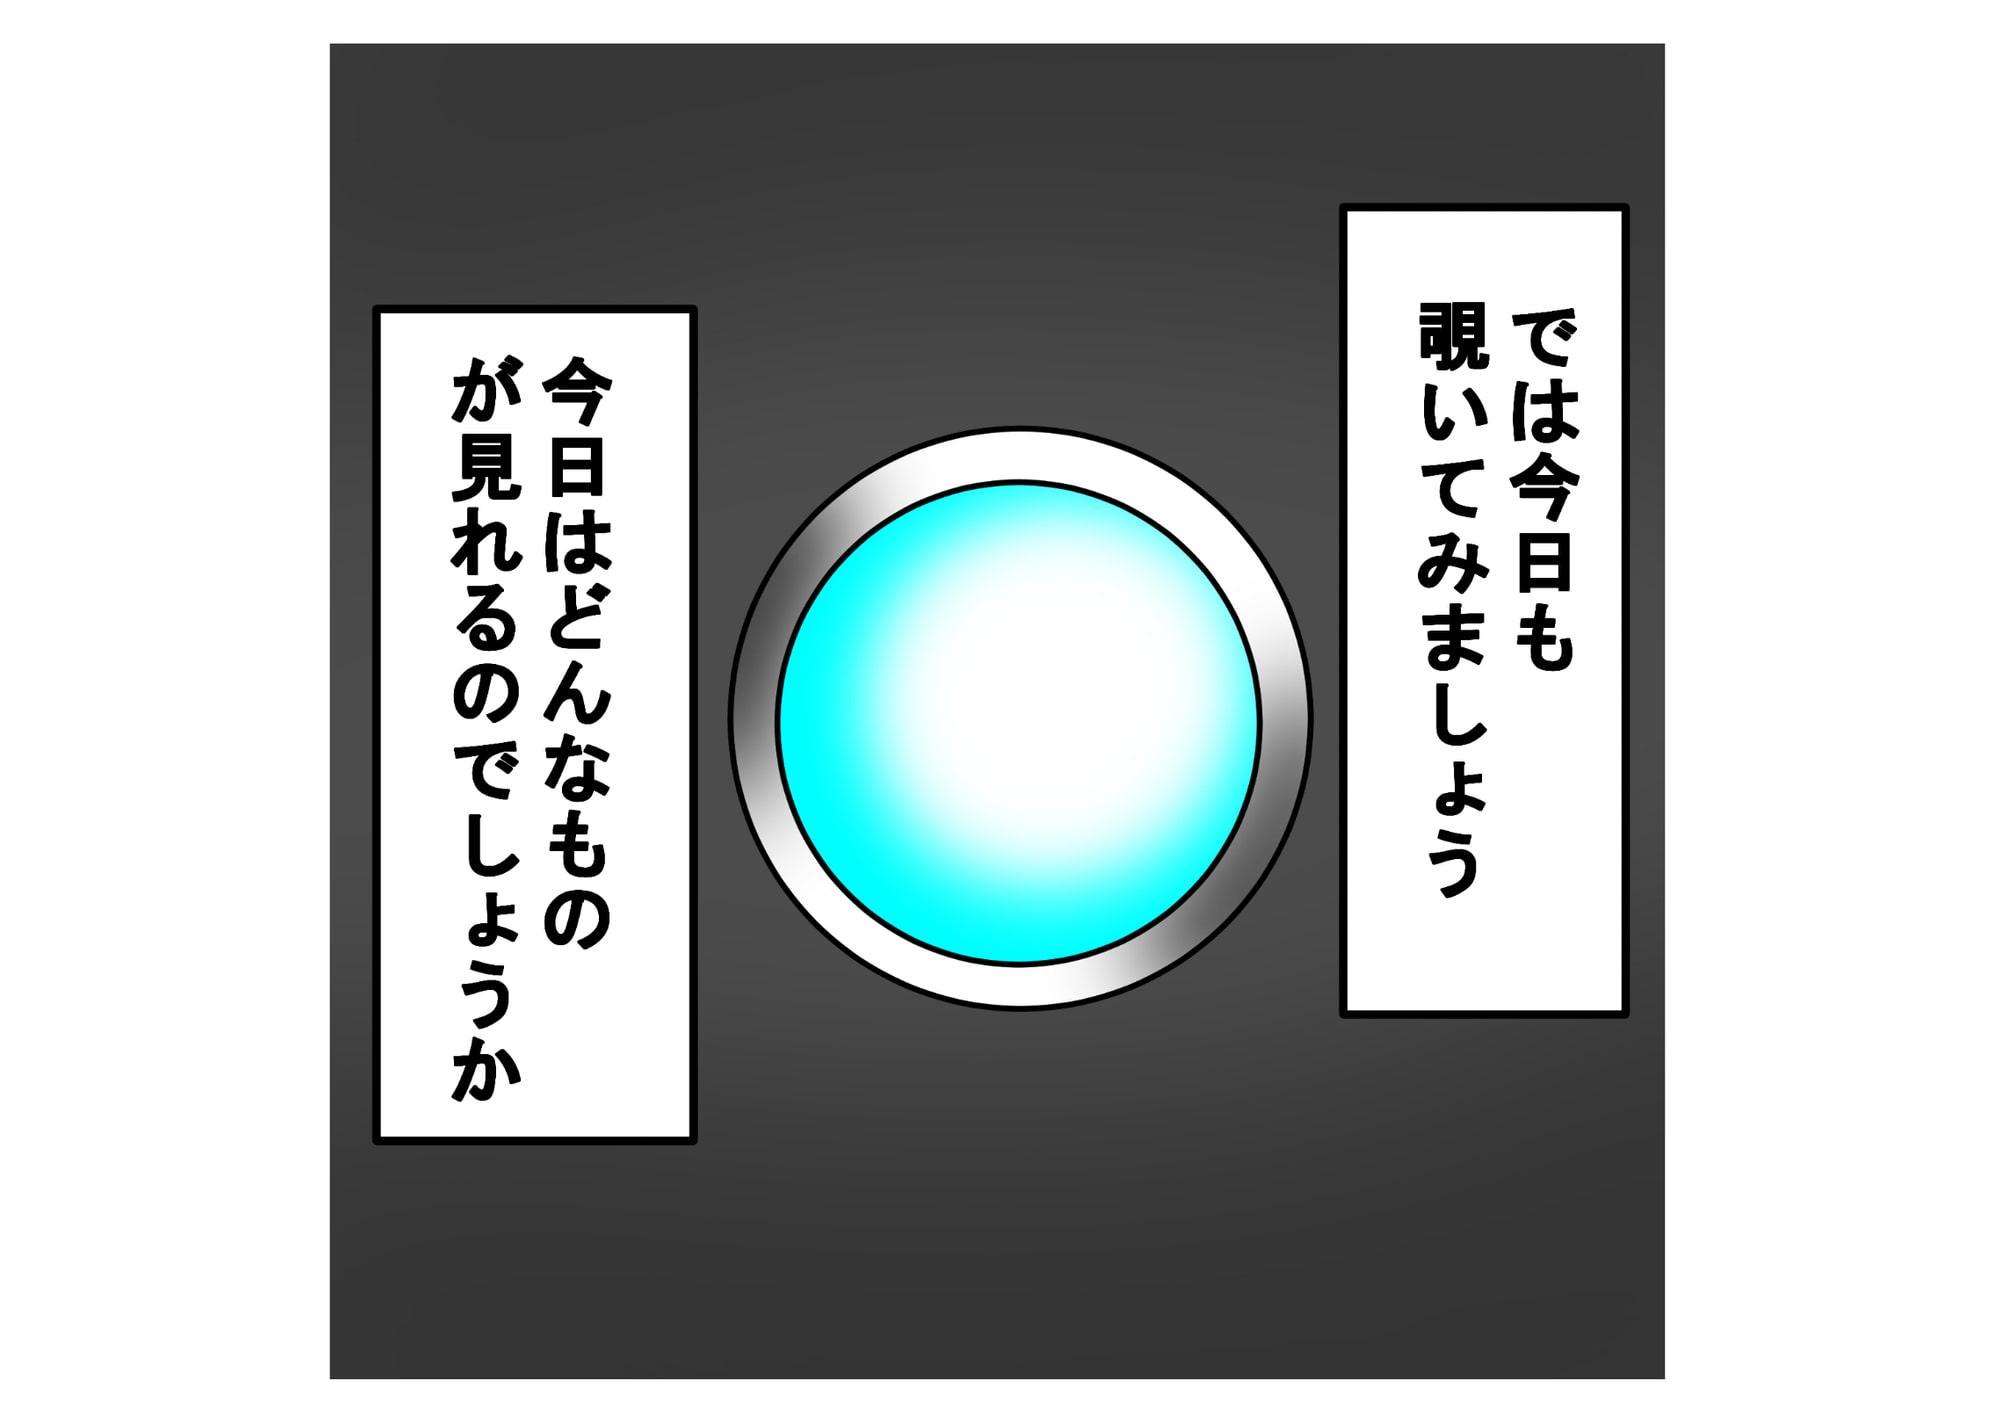 RJ344909 のぞき大歓迎今日もヌキに行きます ~全4話 総集編~ [20210927]